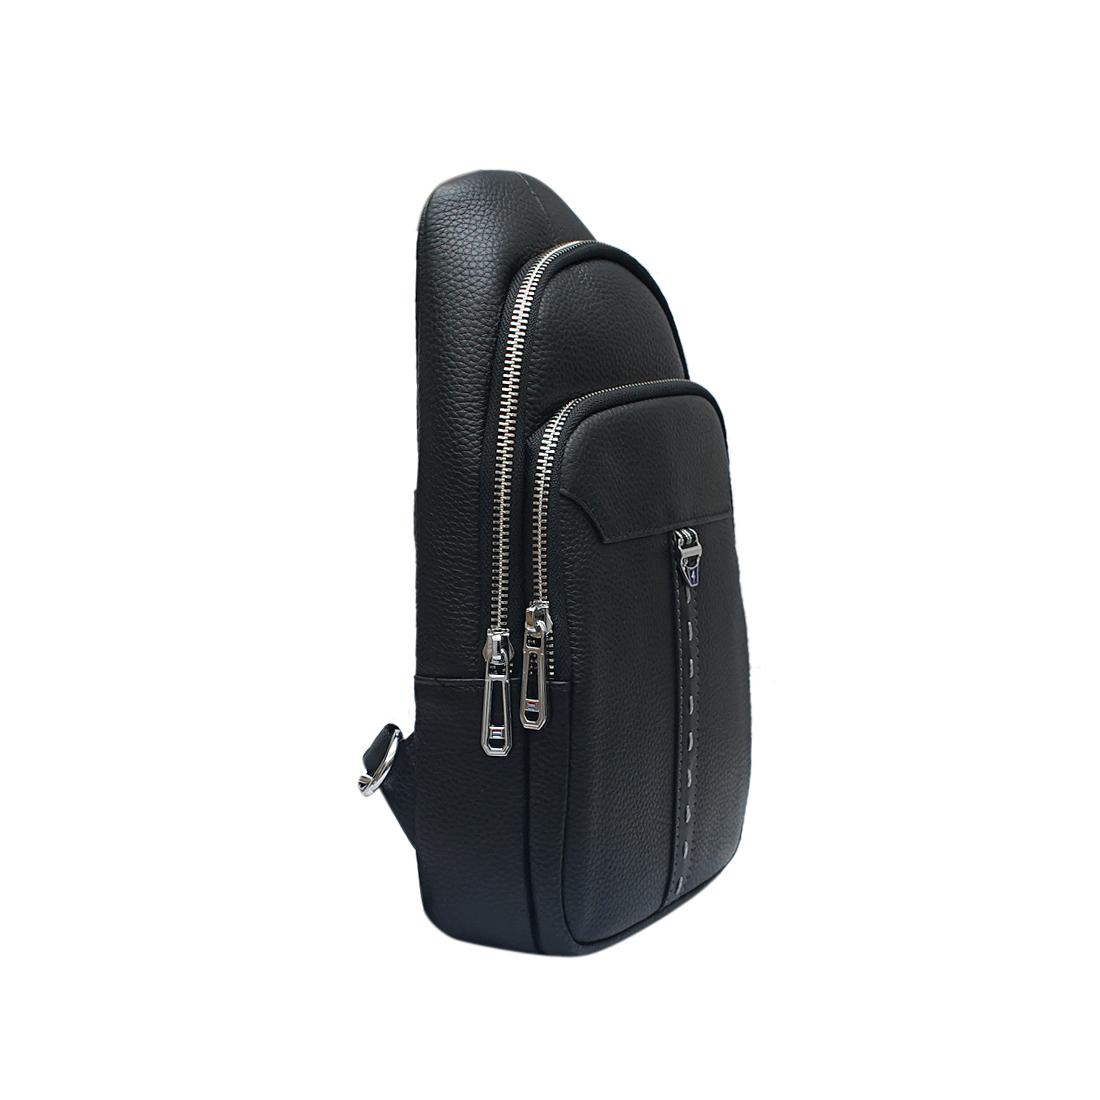 Túi đeo vai nam ELMI da bò thật cao cấp màu đen EB306